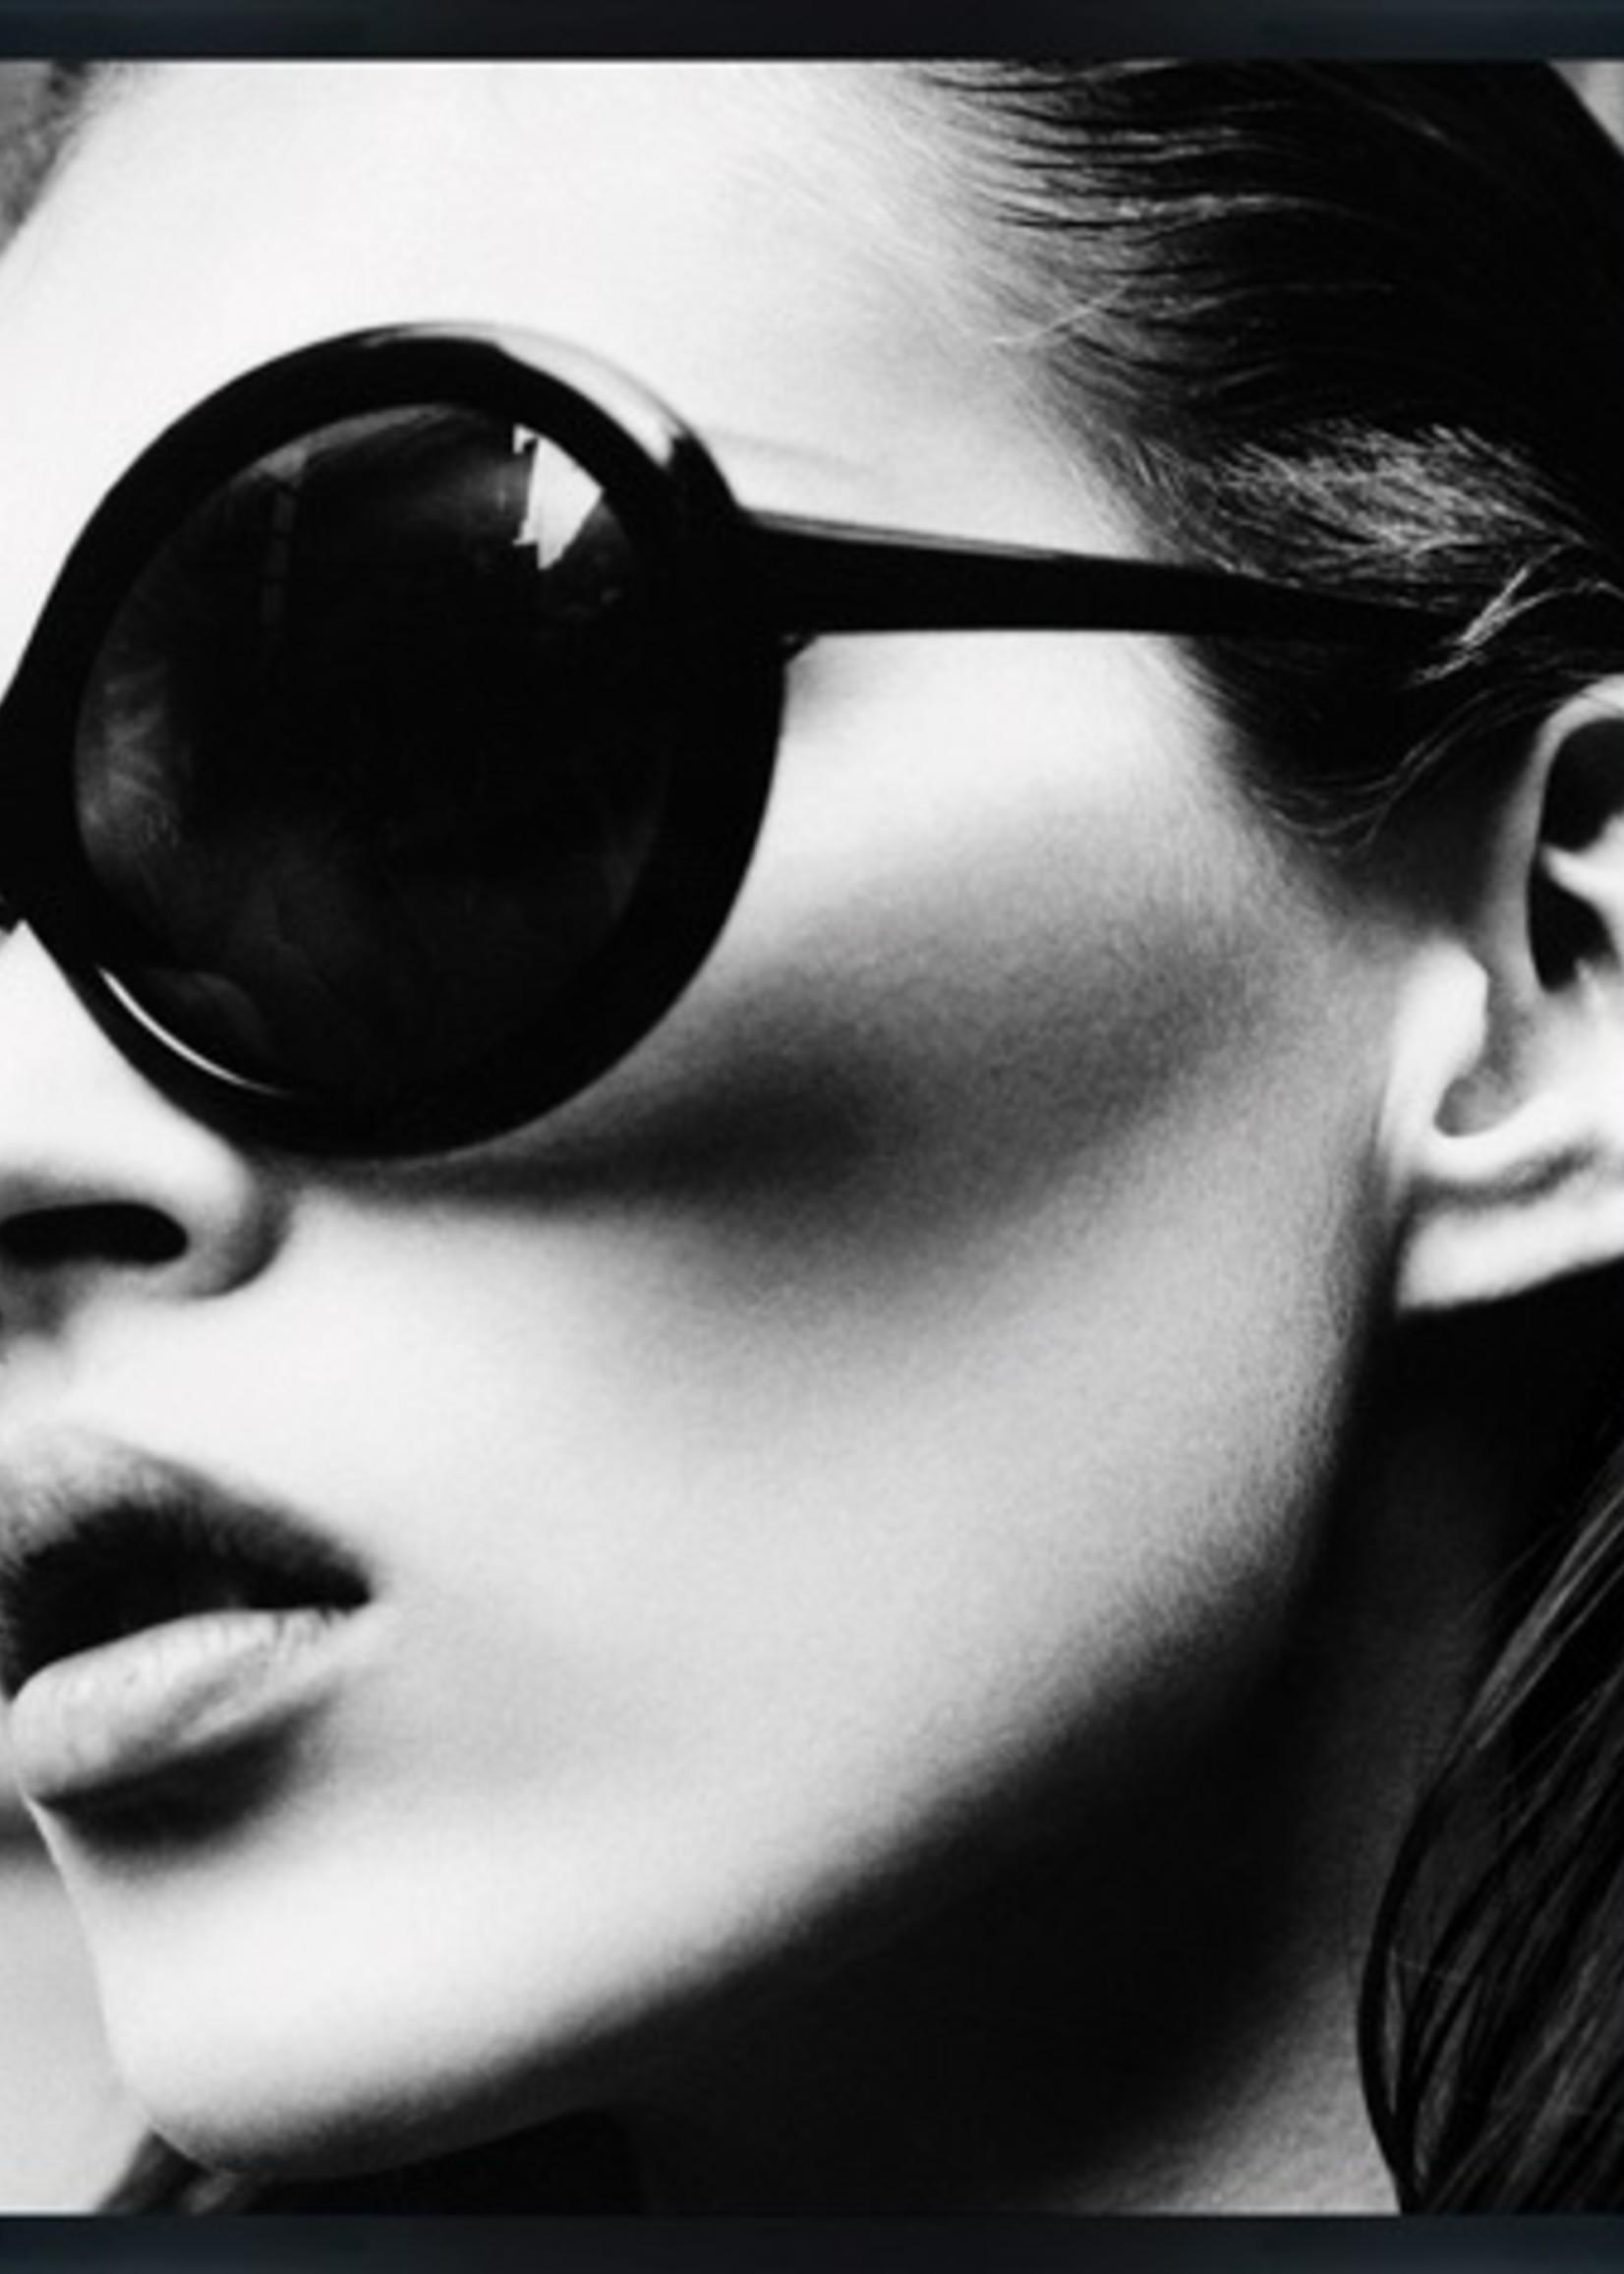 MondiArt Kate moss sunglasses 60/80